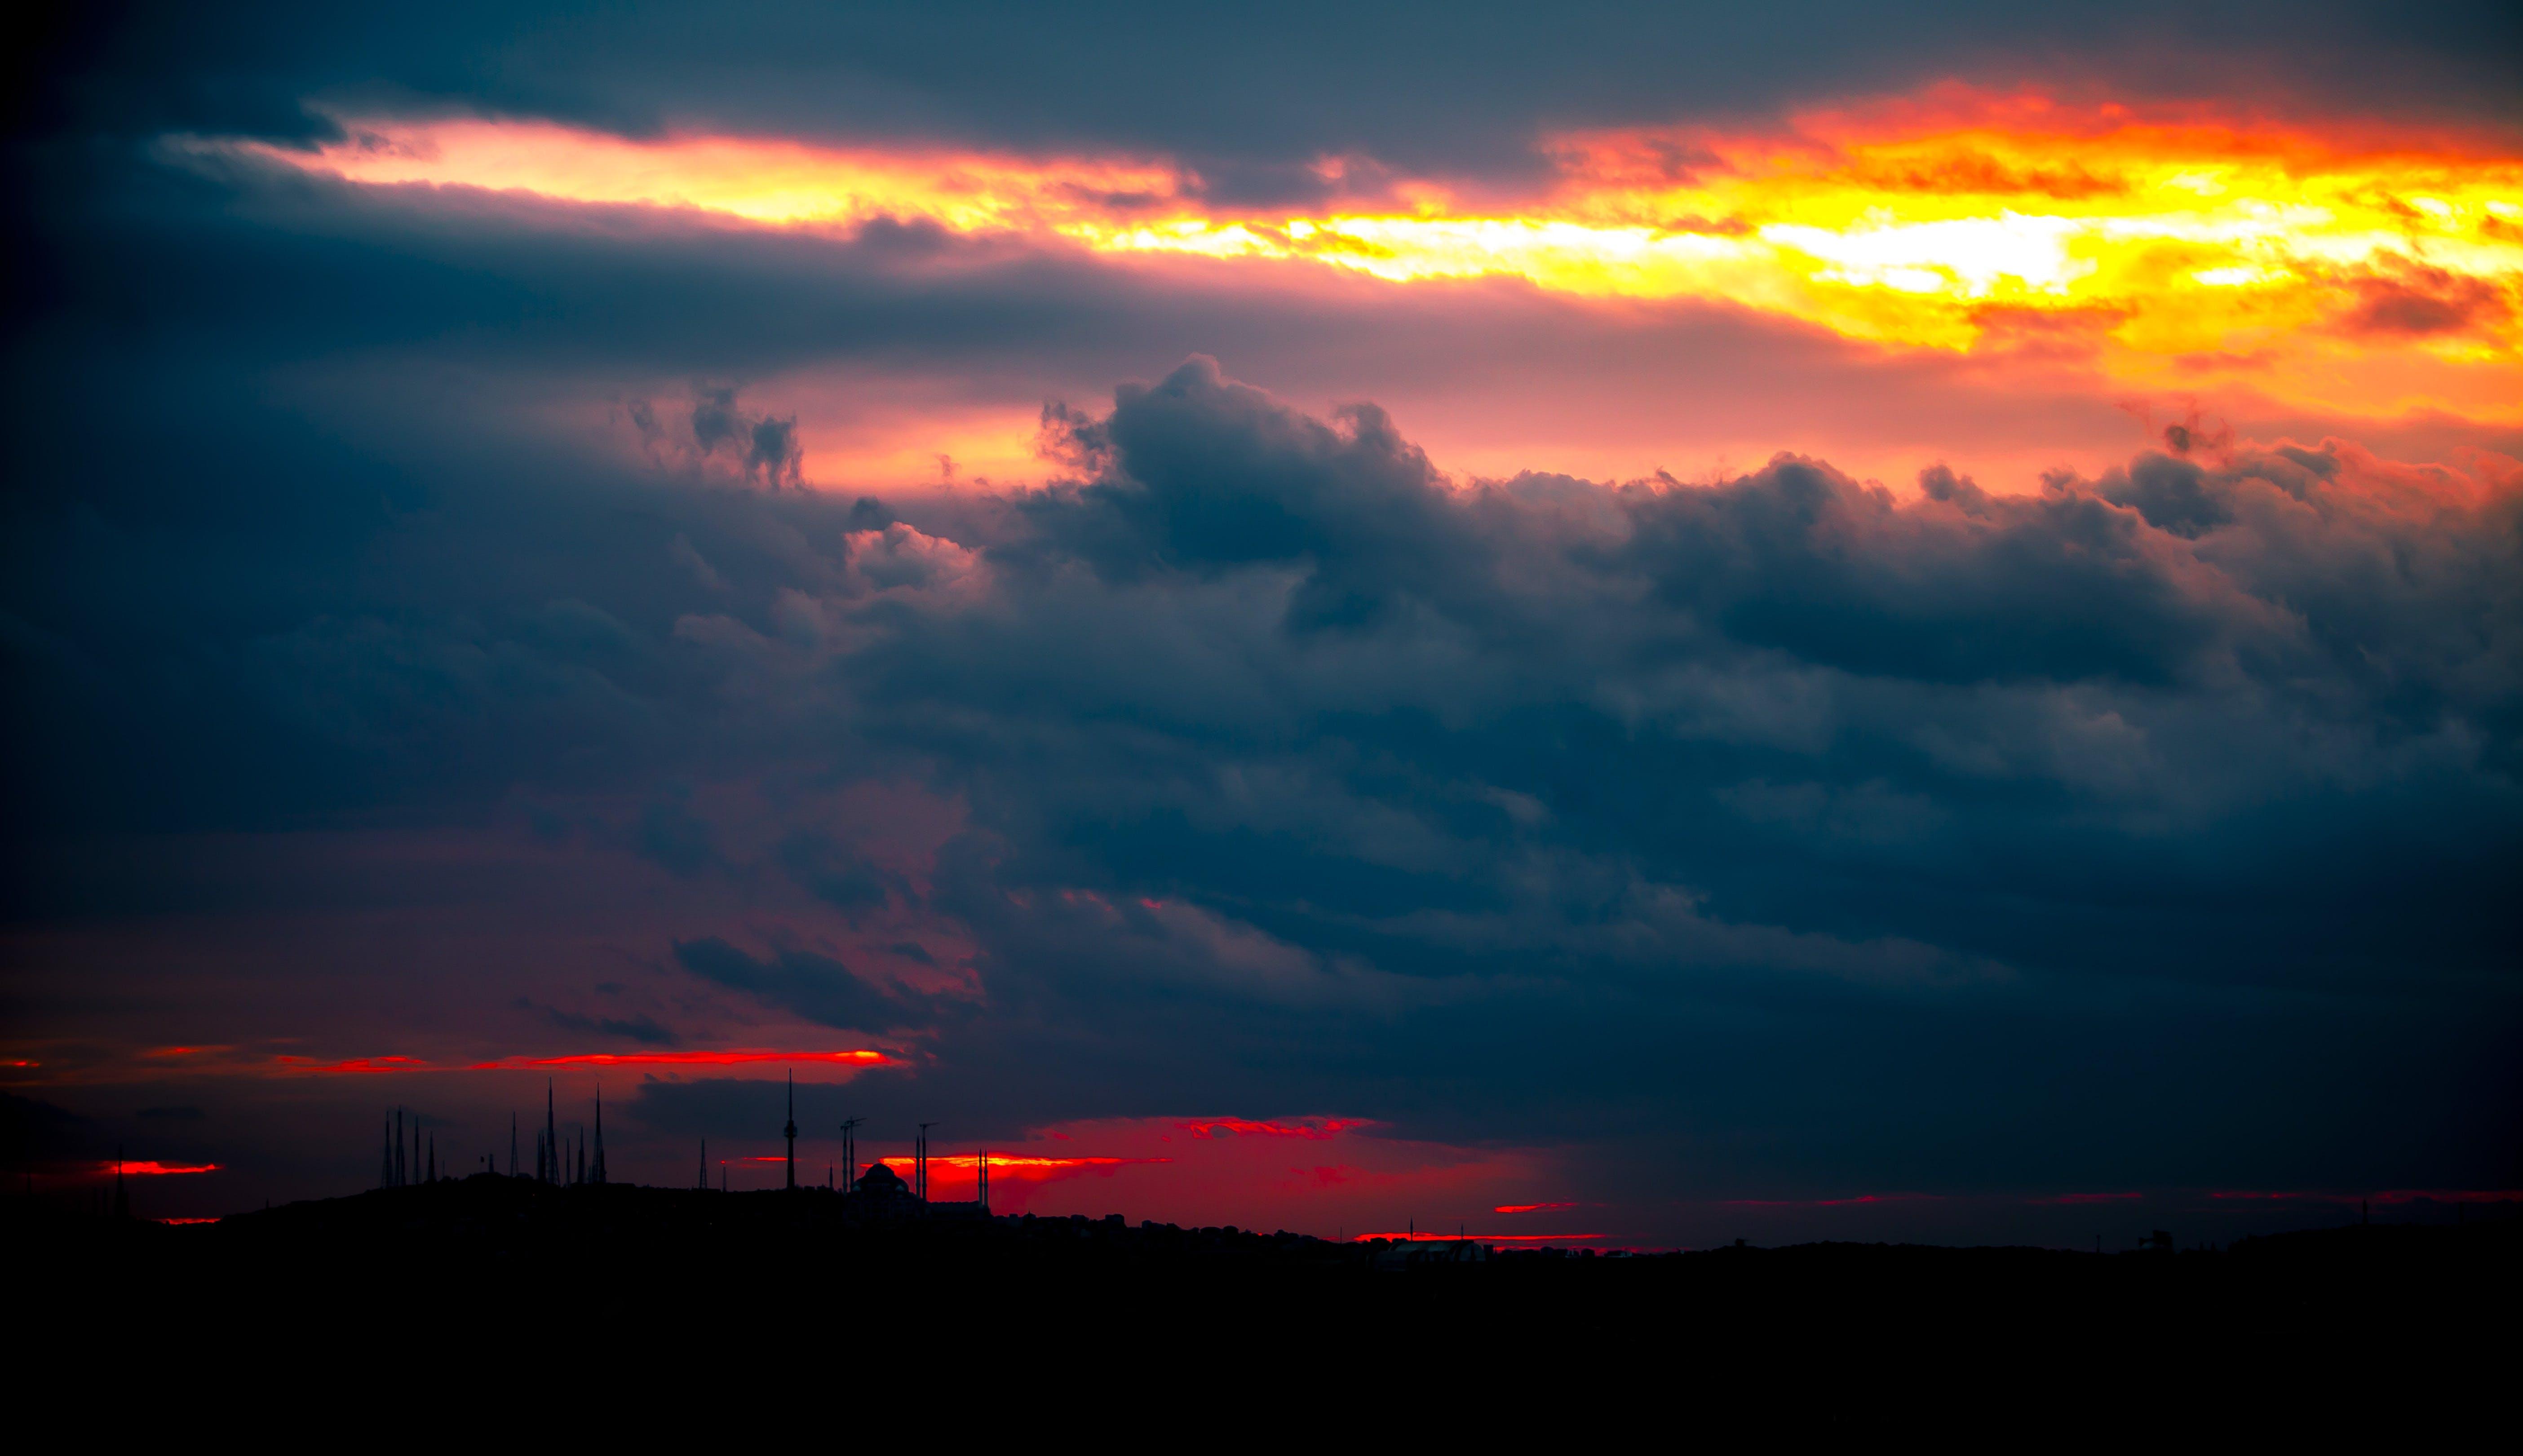 afterglow, background, backlit